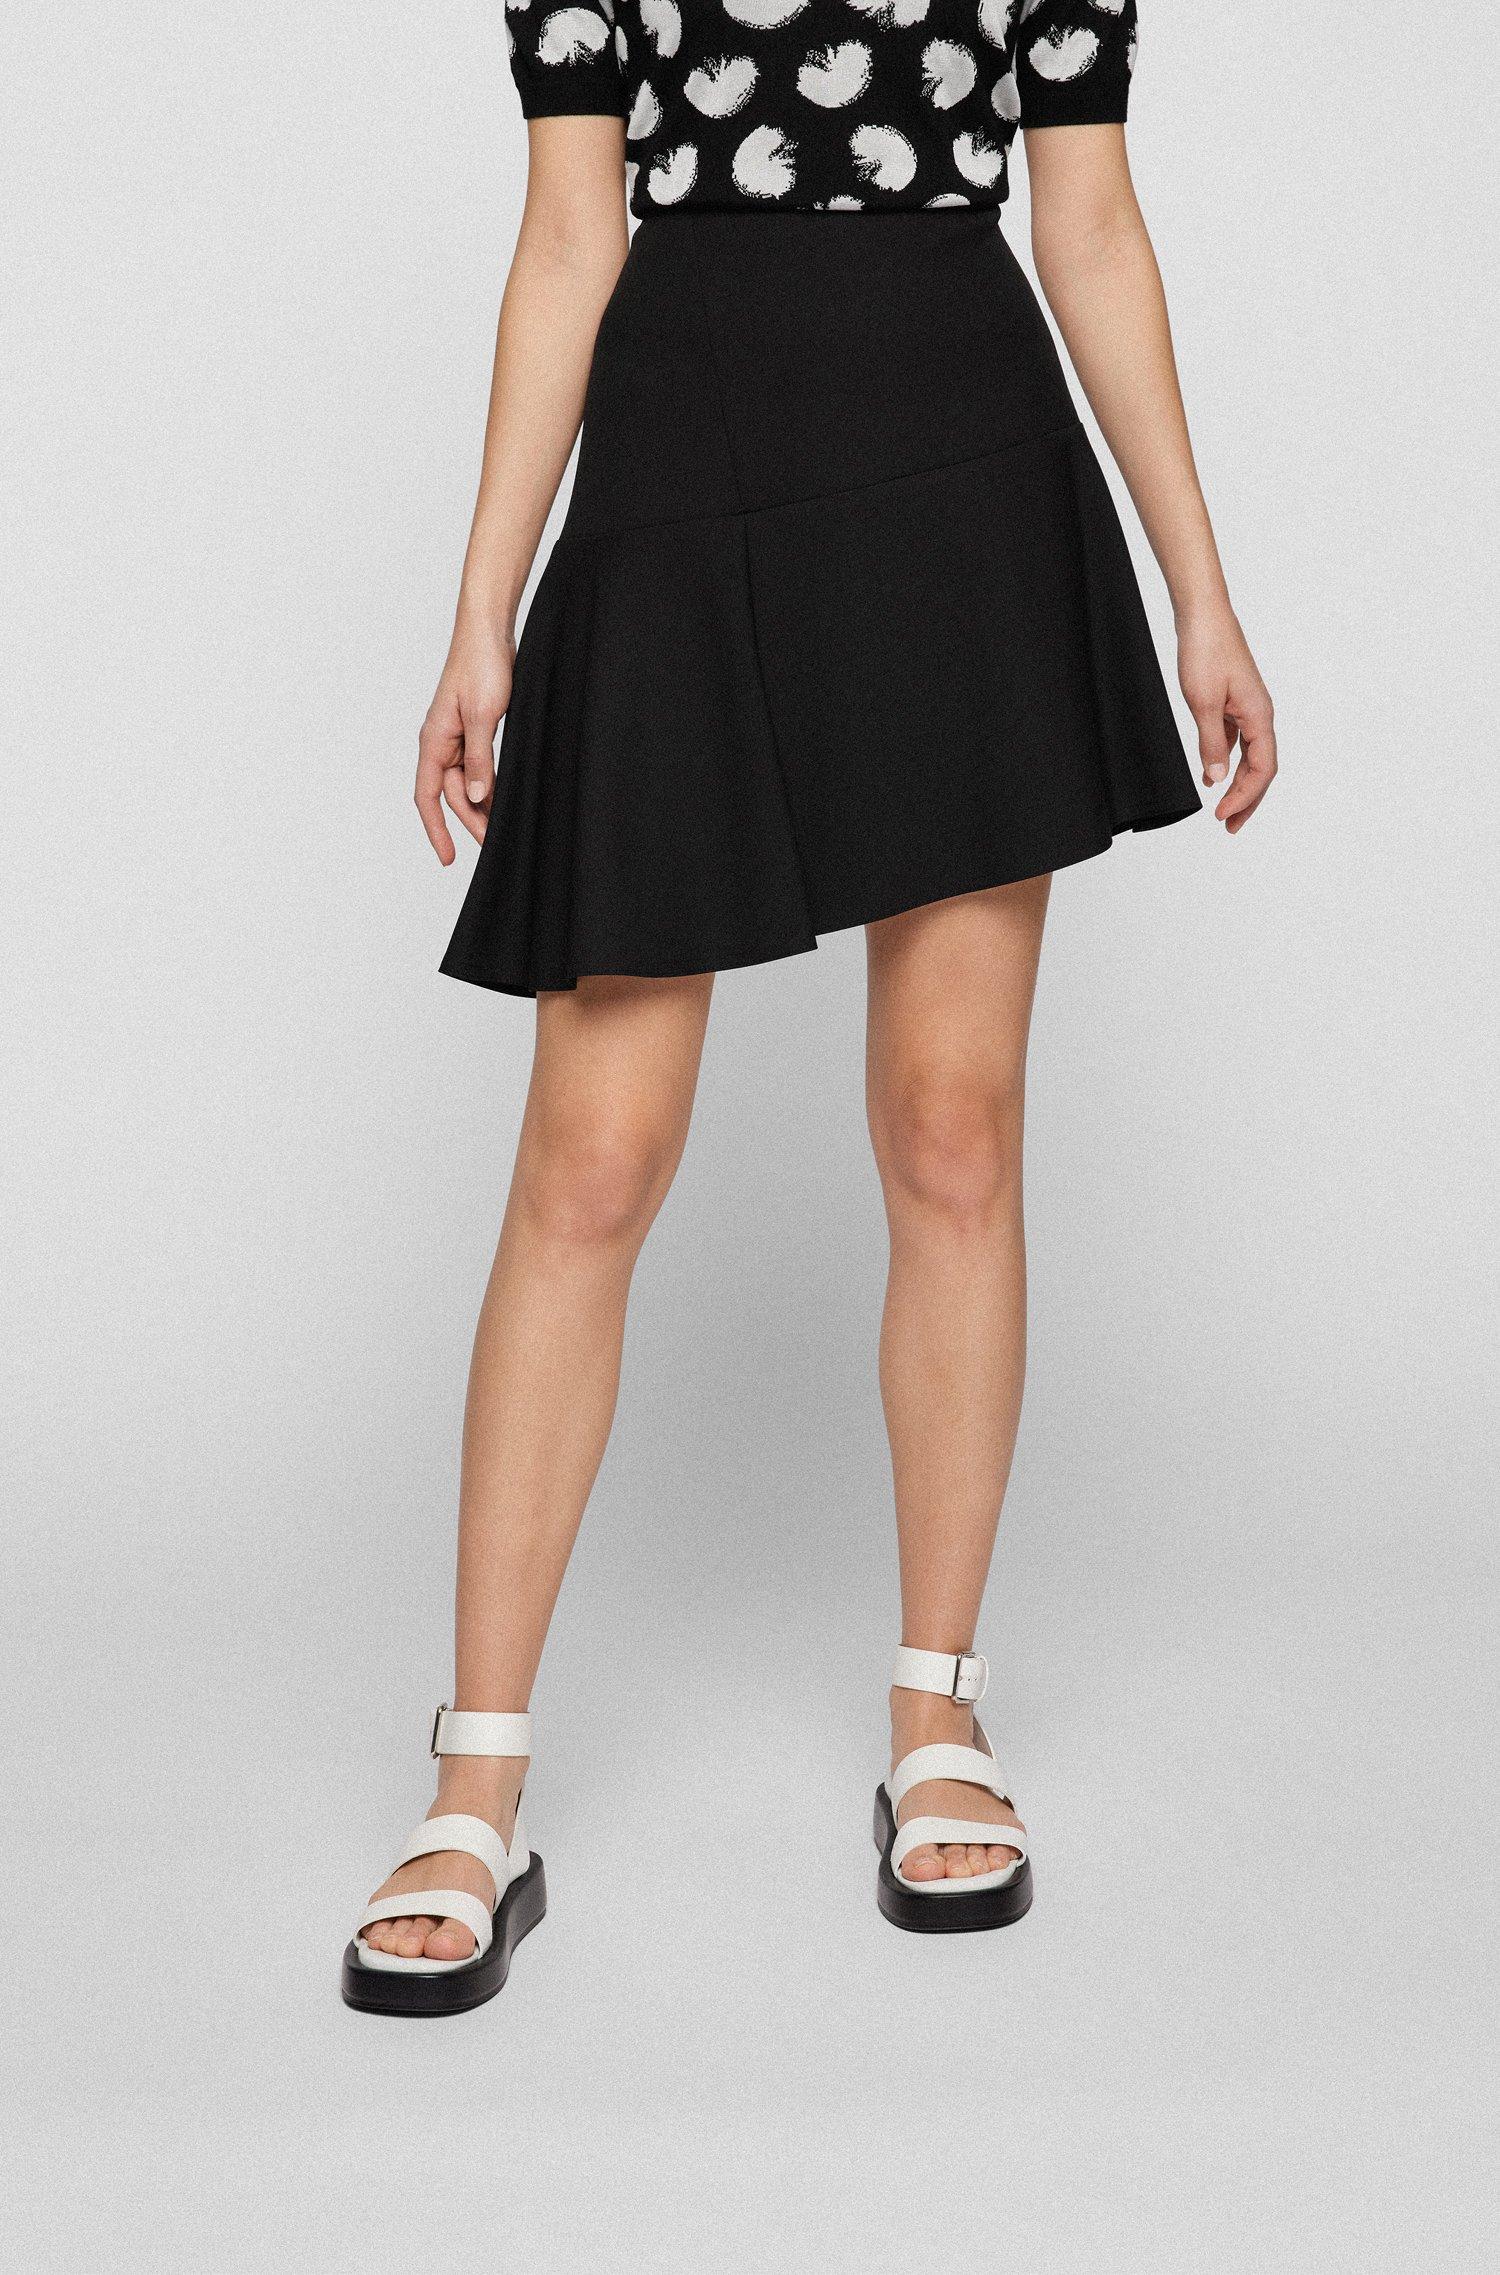 A-line skirt in stretch fabric with asymmetric hem, Black